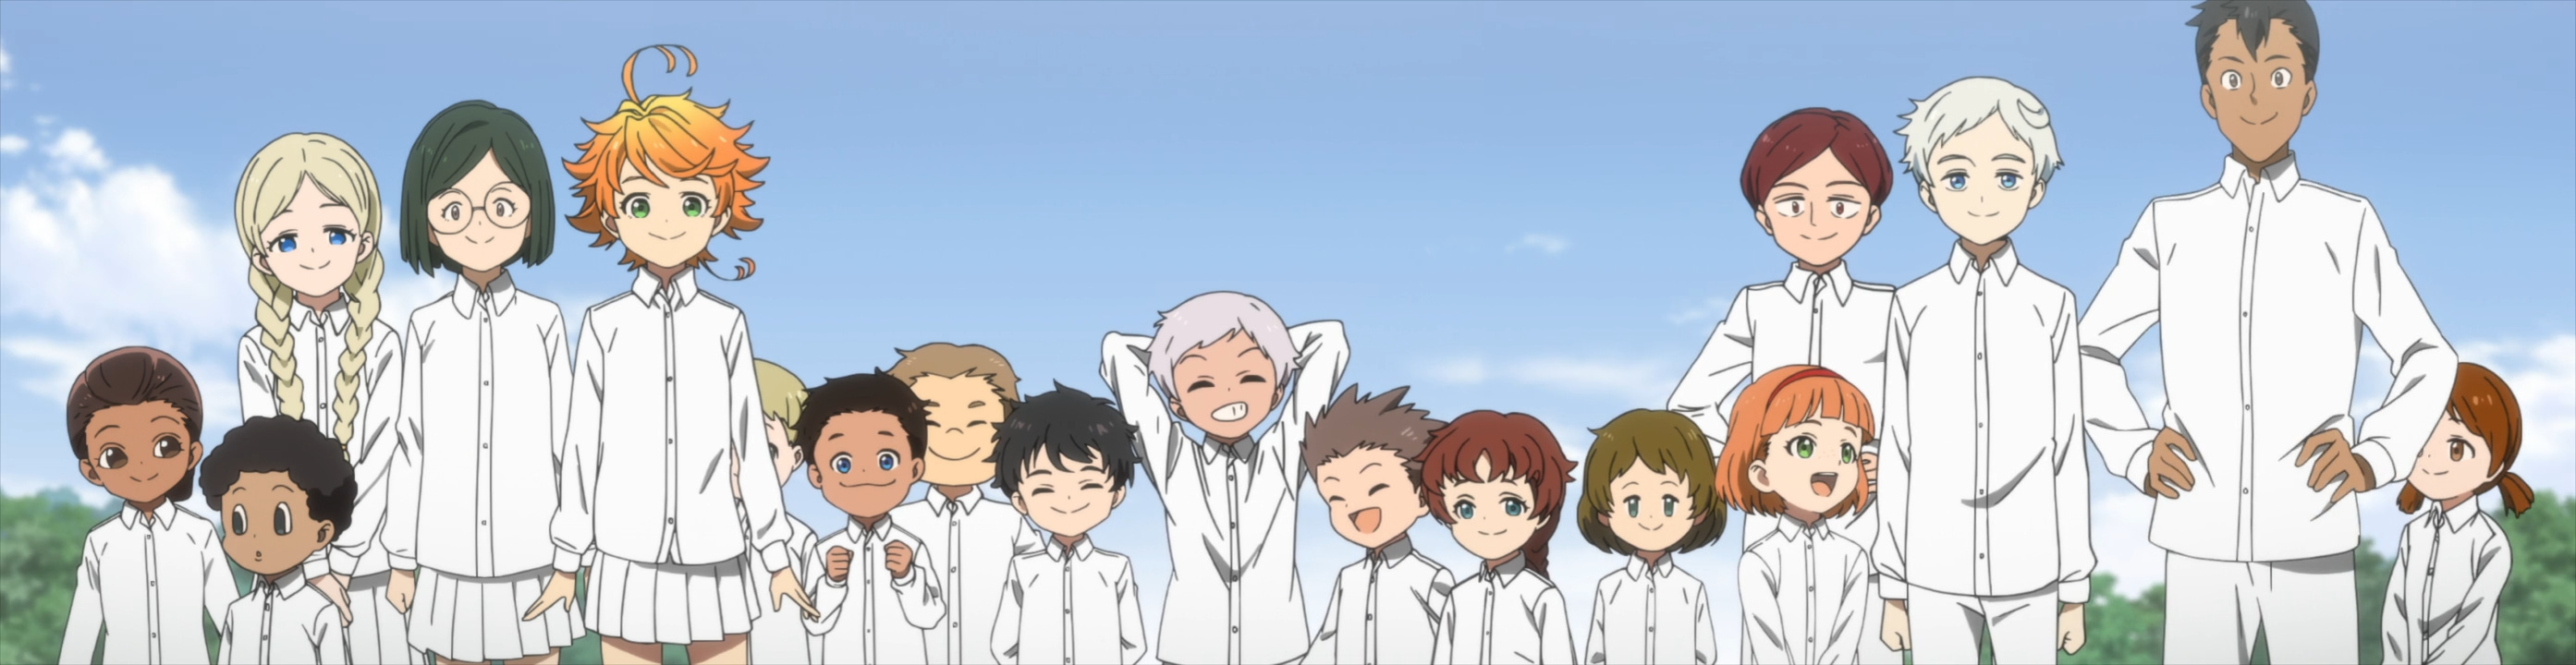 Yakusoku no Neverland T.V. Media Review Episode 4 | Anime Solution